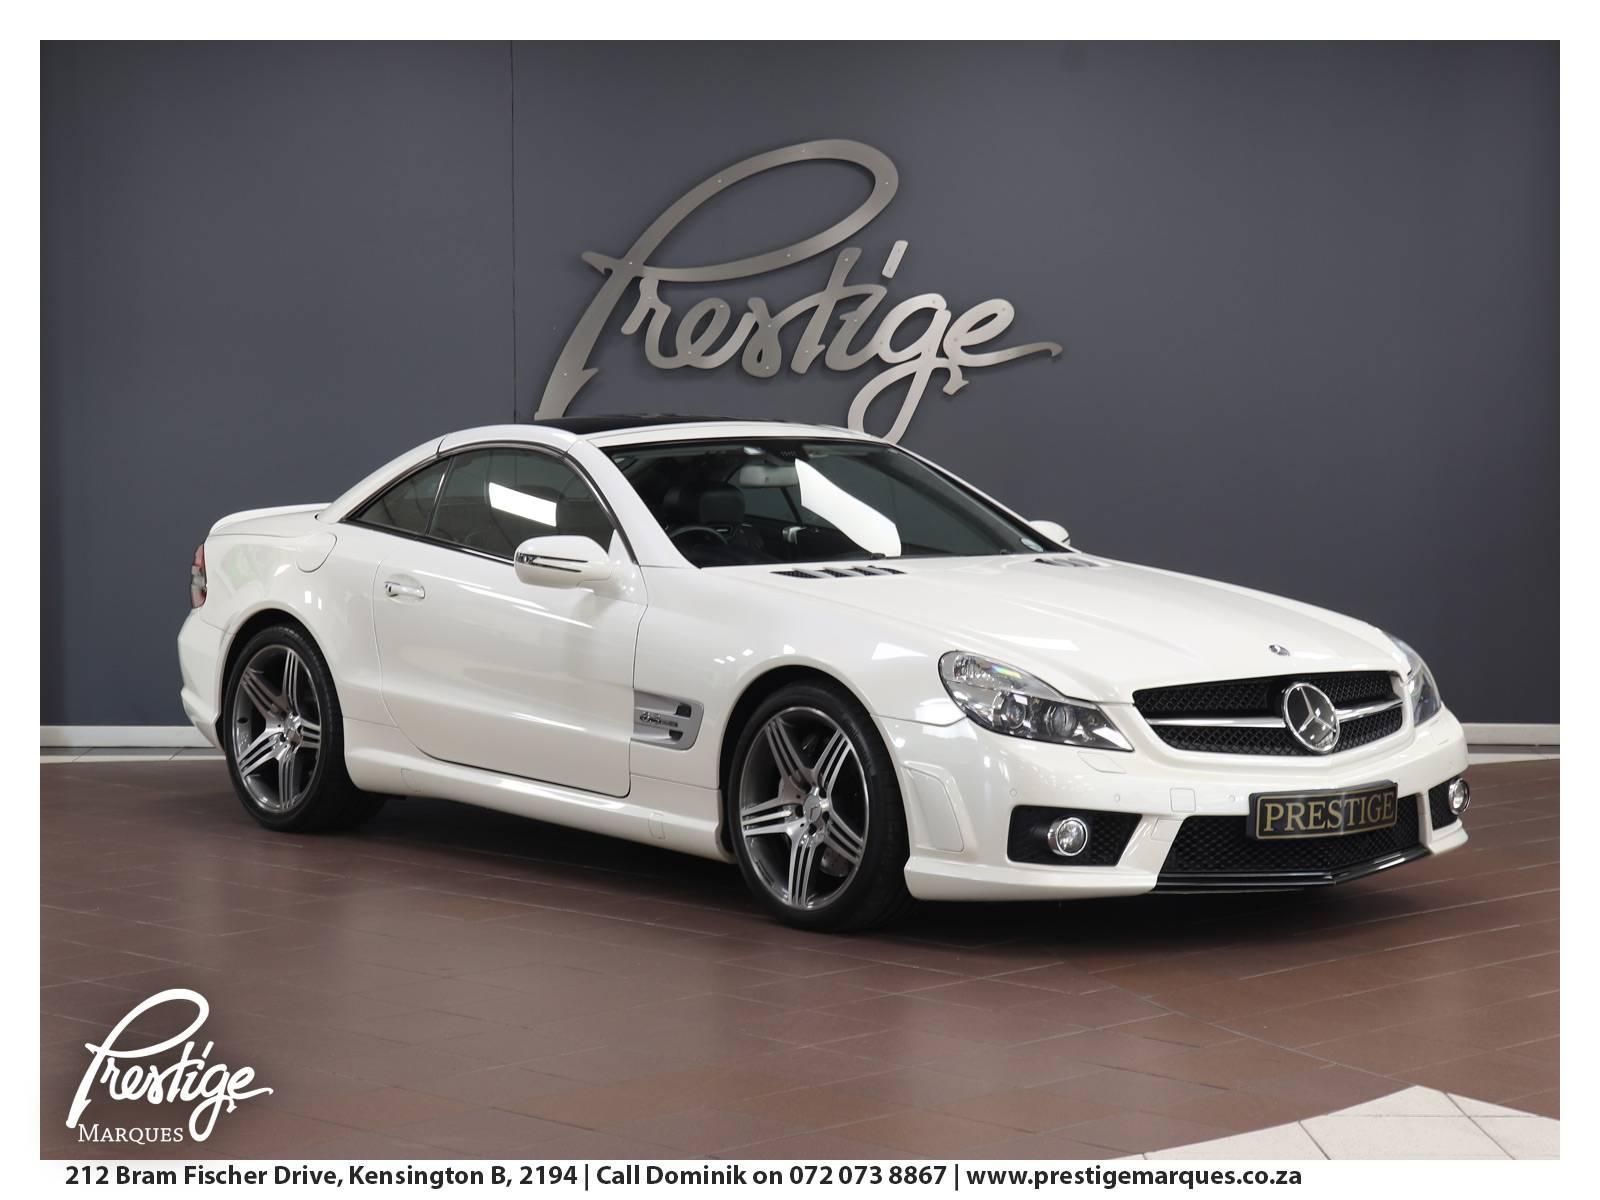 Mercedes-benz-sl-63-amg-prestige-marques-randburg-sandton-3